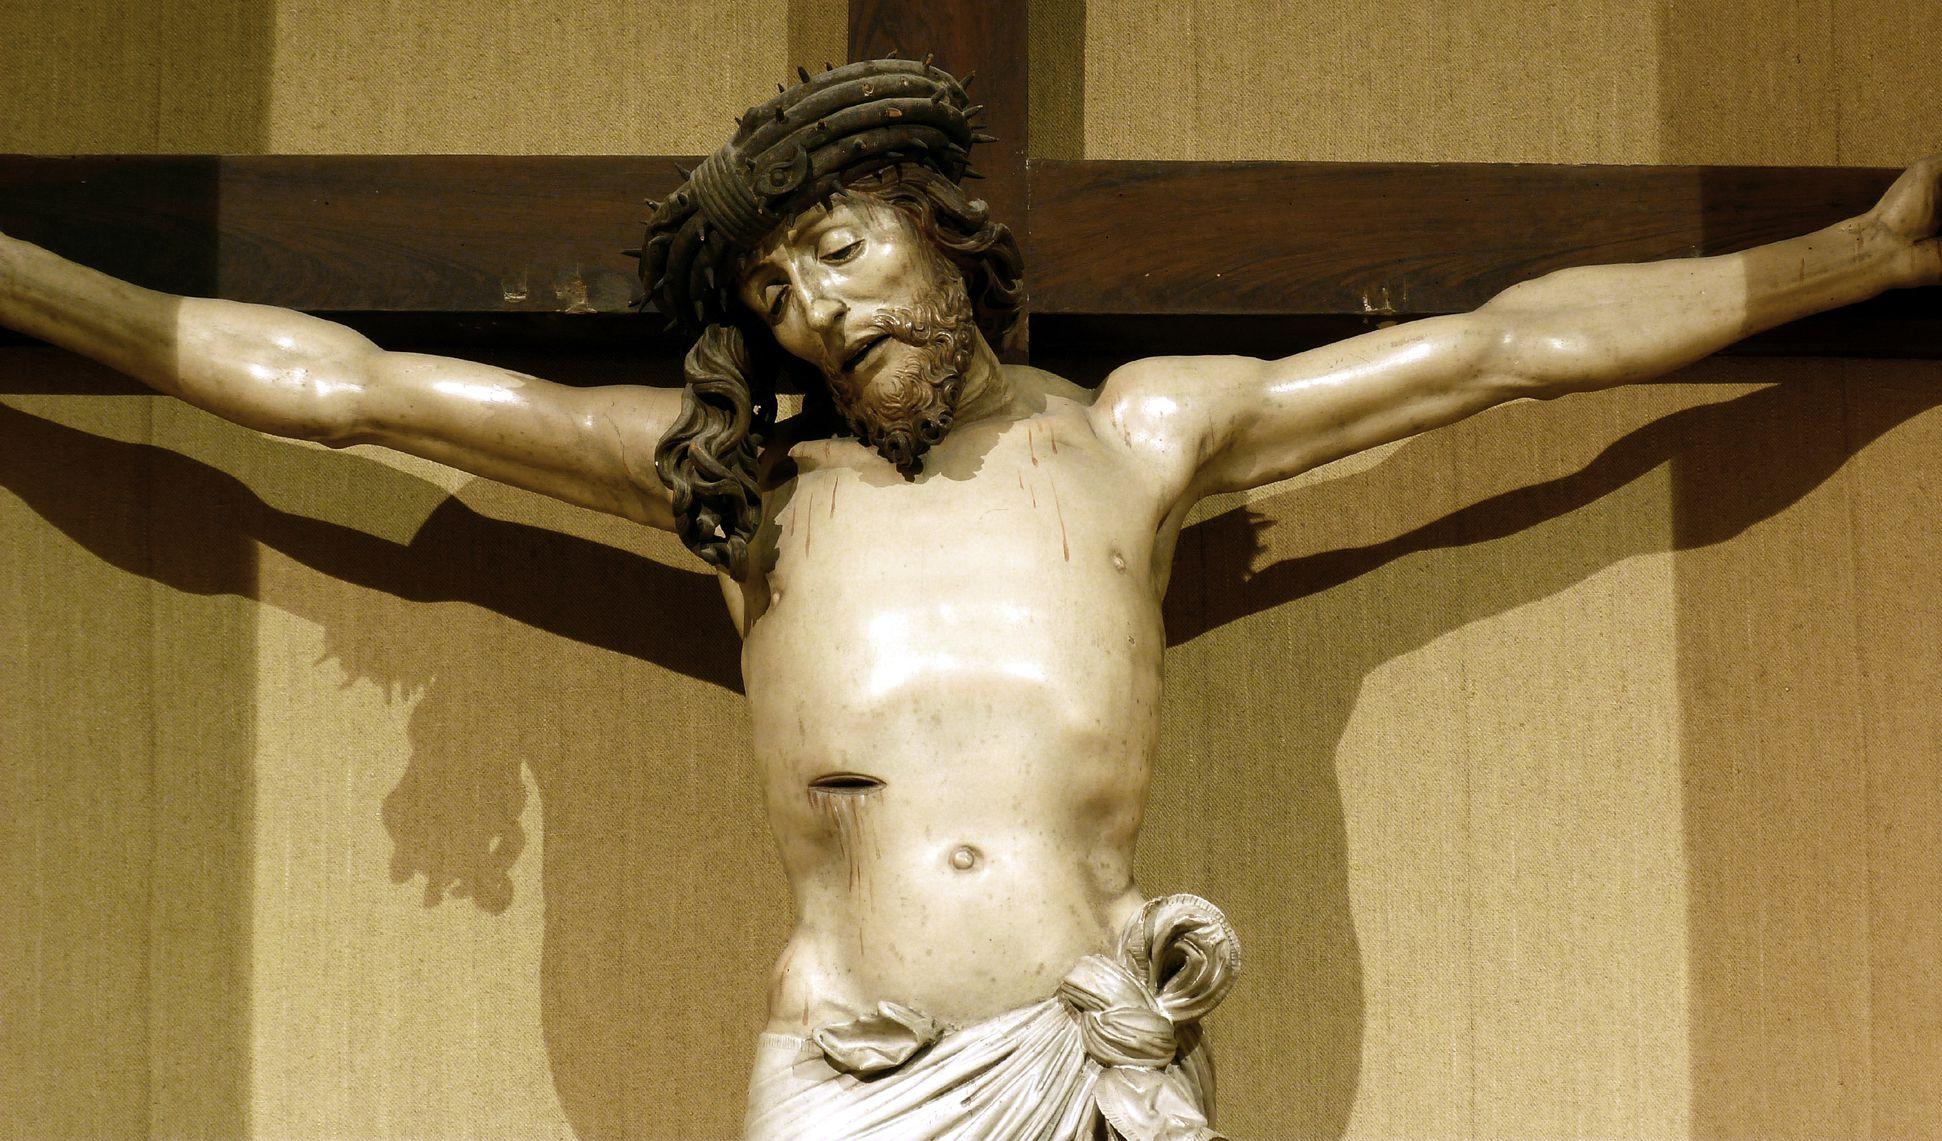 Crucifixus Upper part of the body